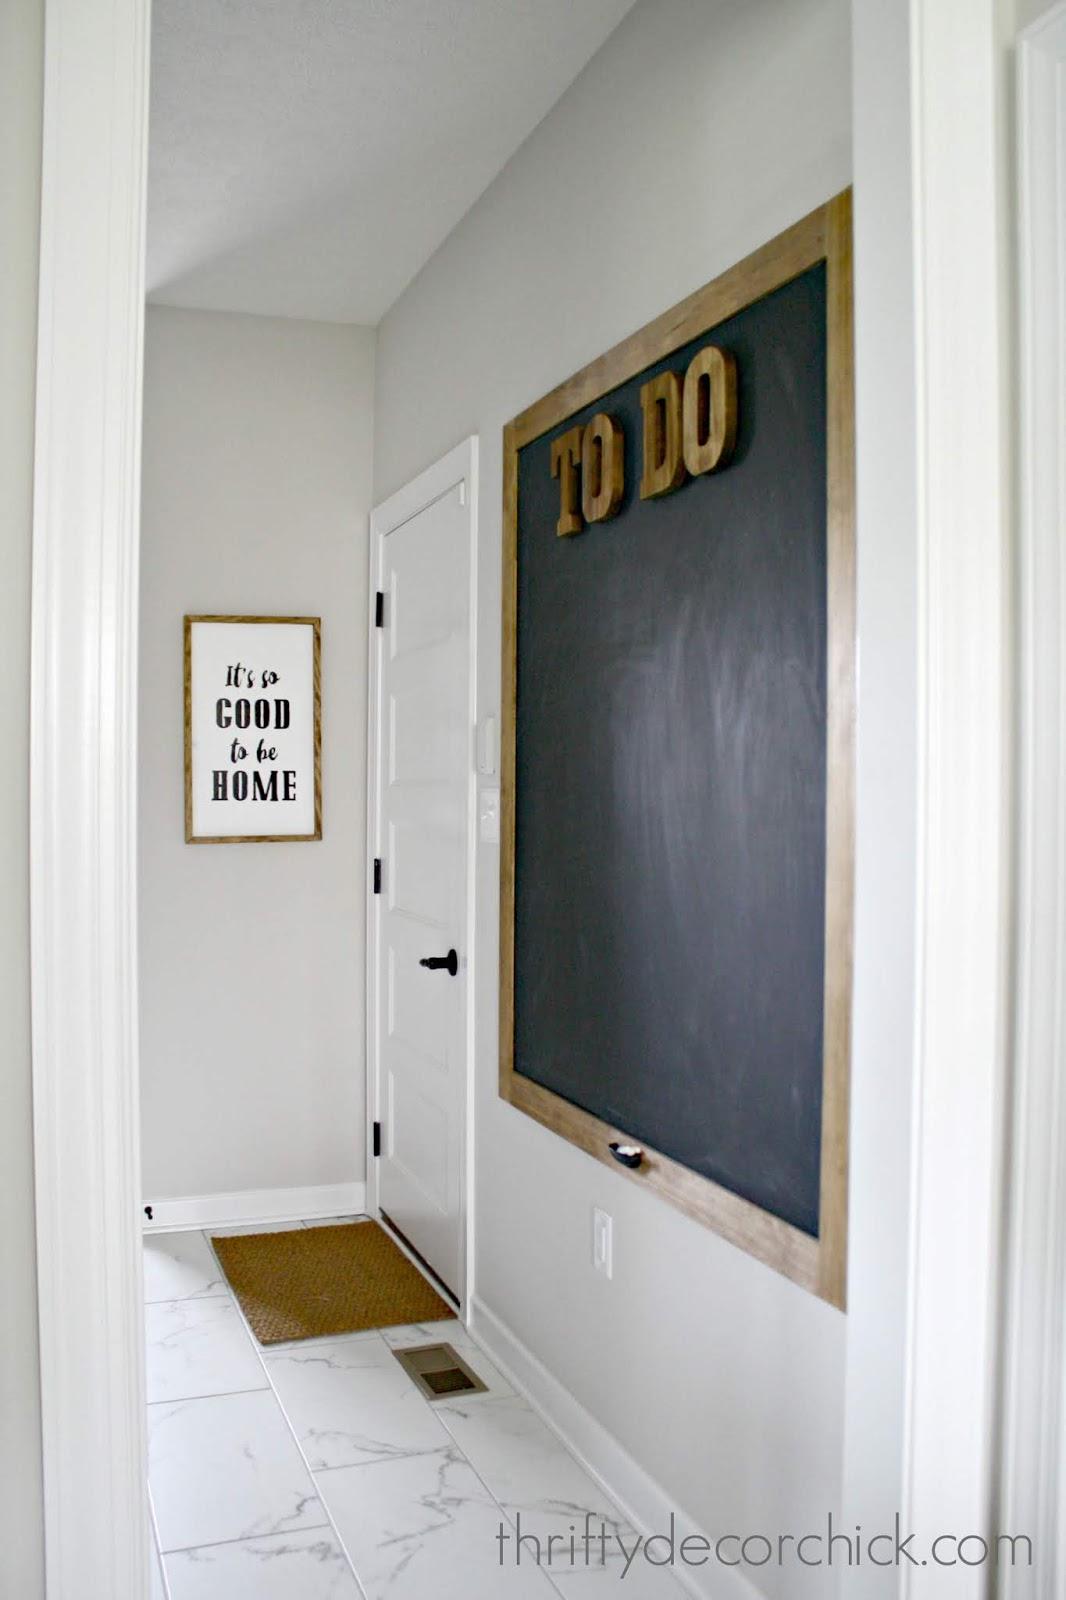 Large DIY chalkboard wall